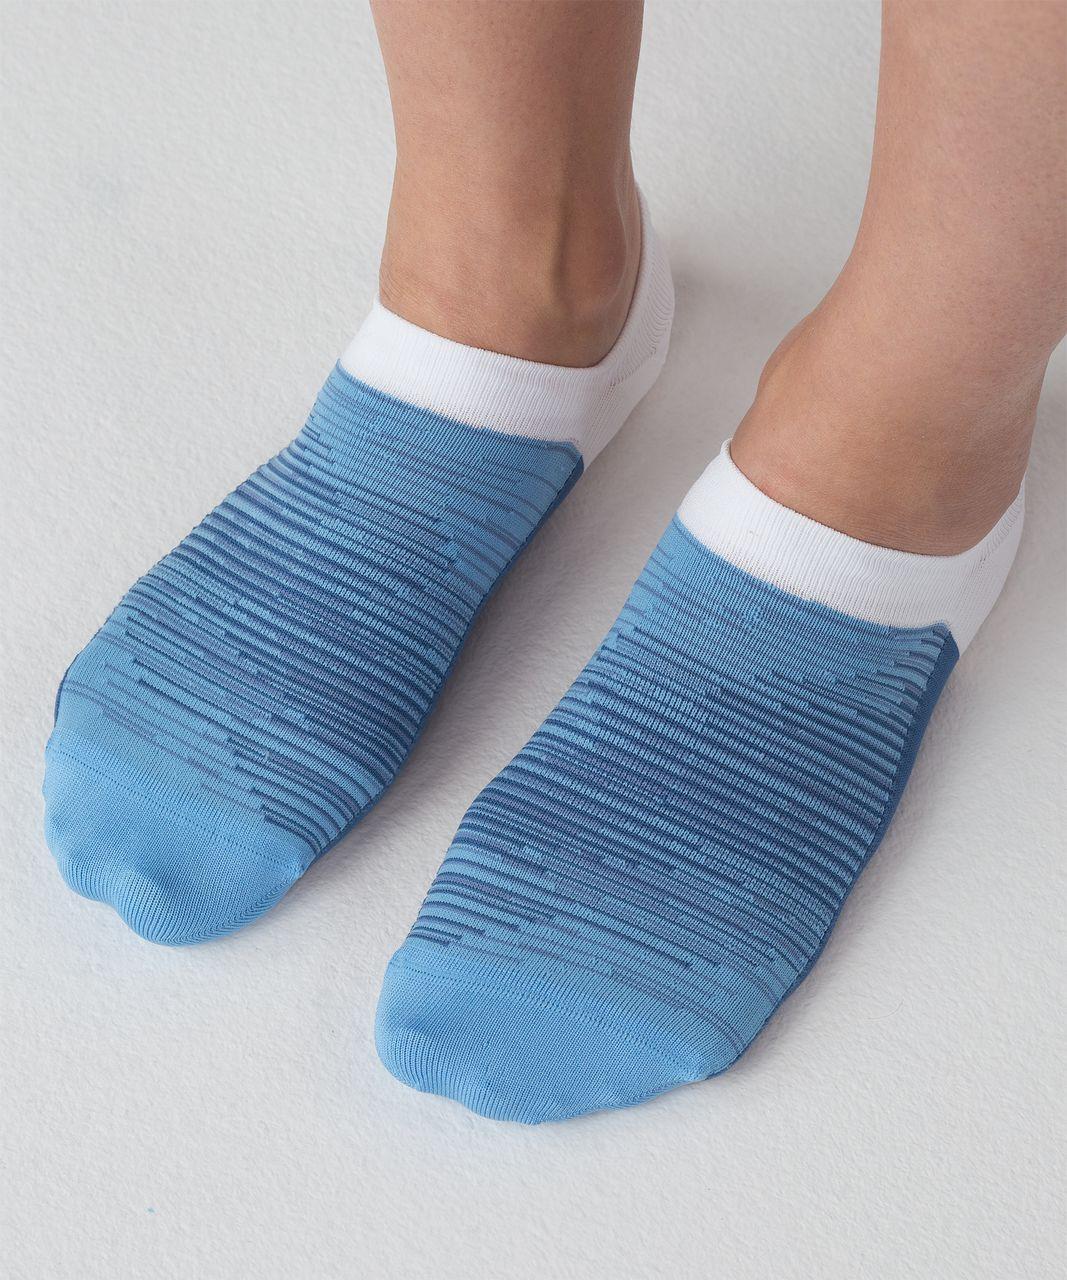 Lululemon Play All Day Sock - Aero Blue / Royal